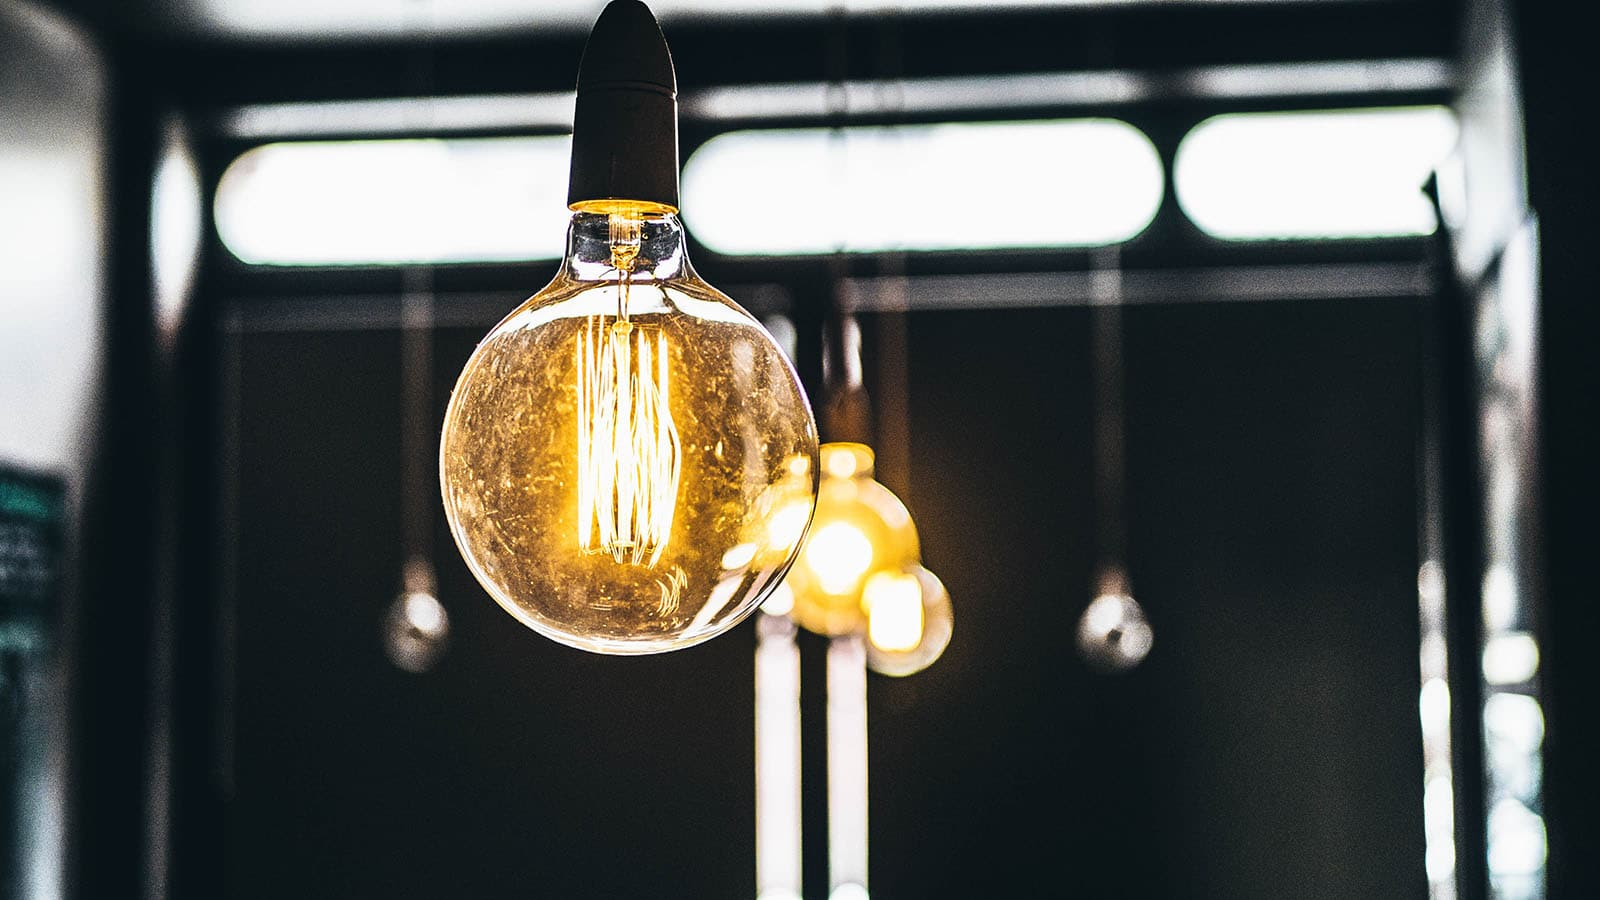 Lightbulbs close up image